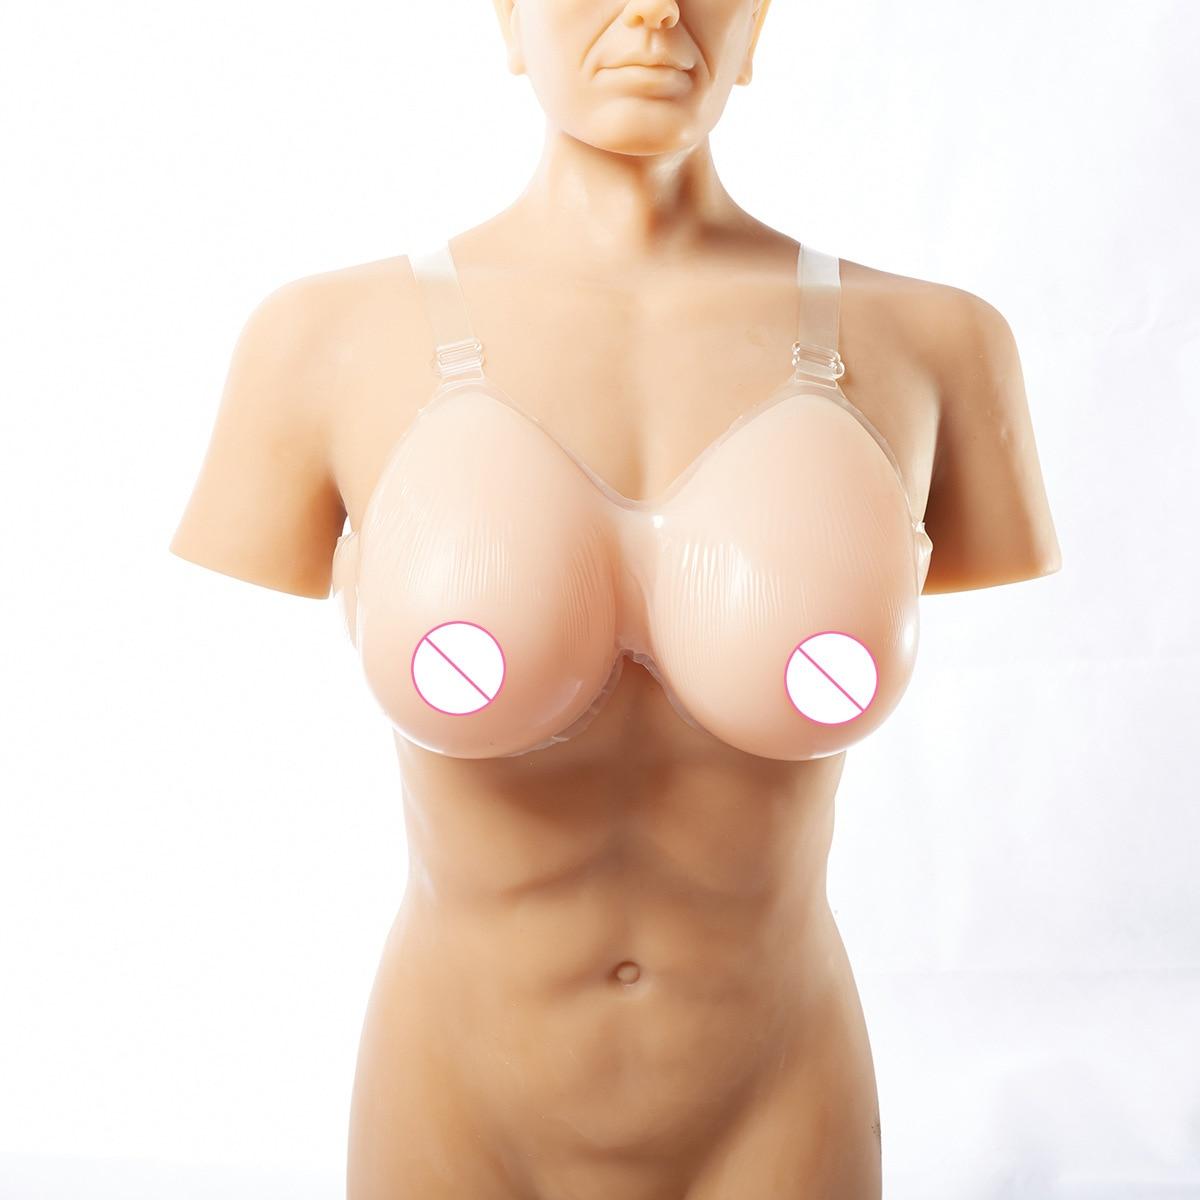 1 pcs 착용 할 수있는 가짜 실리콘 유방 모양 유방 흉상 증강 인자 코스프레 여자를위한 가짜 가슴 1200g 피부 색깔 e 컵을 착용하는 가슴의  그룹 1